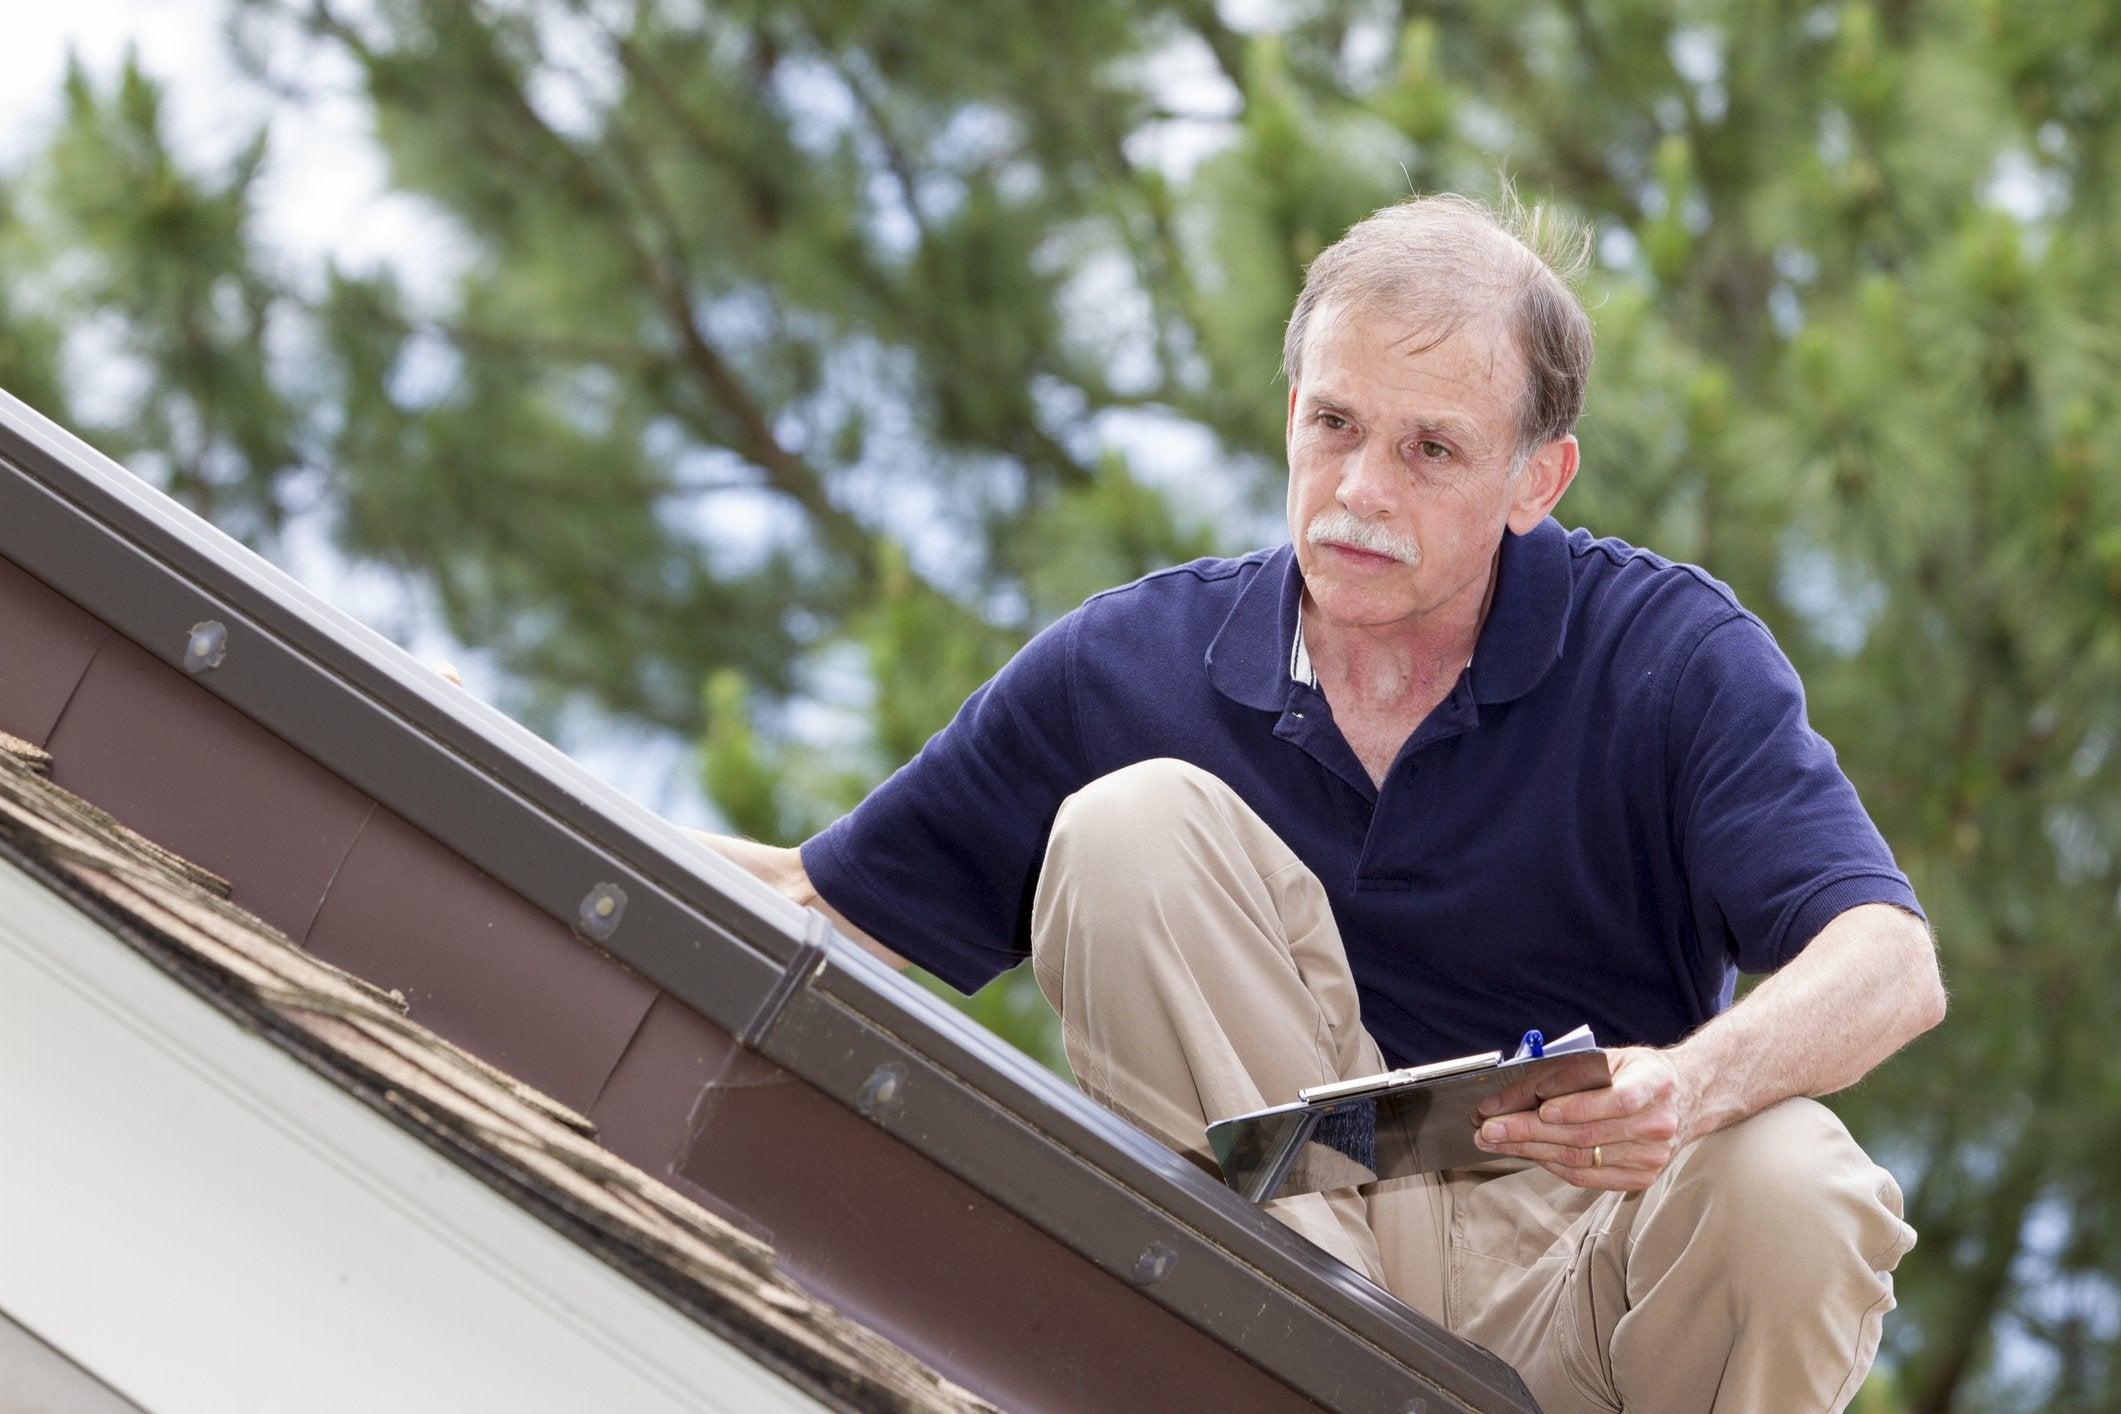 Contractor skylight